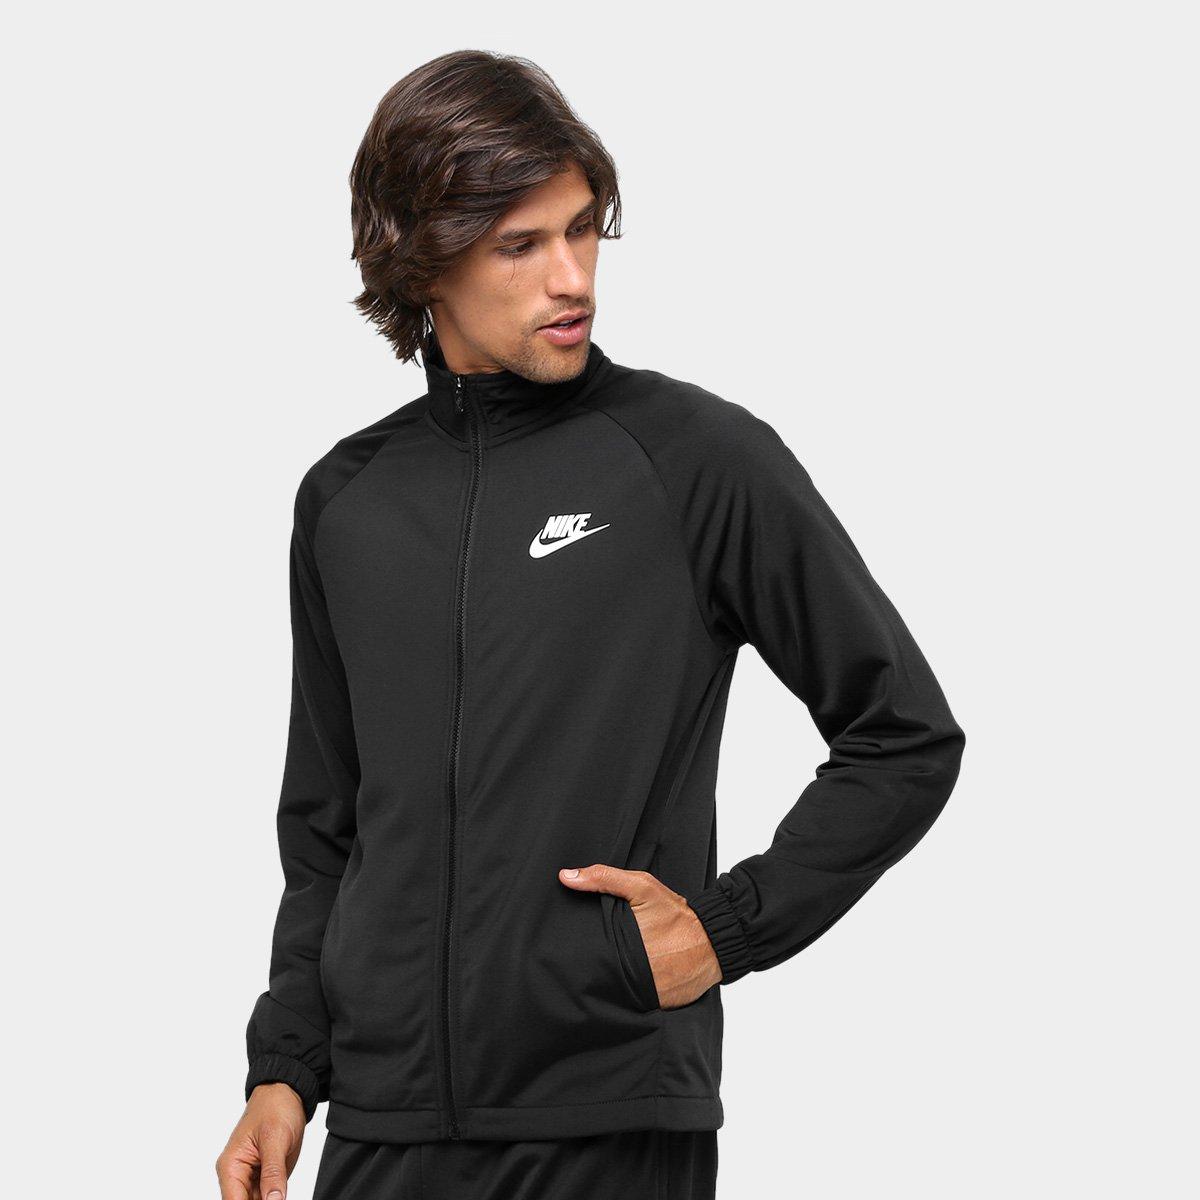 Agasalho Nike Trk Suit Pk Basic Masculino - Preto e Branco - Compre ... d4607f923dd72